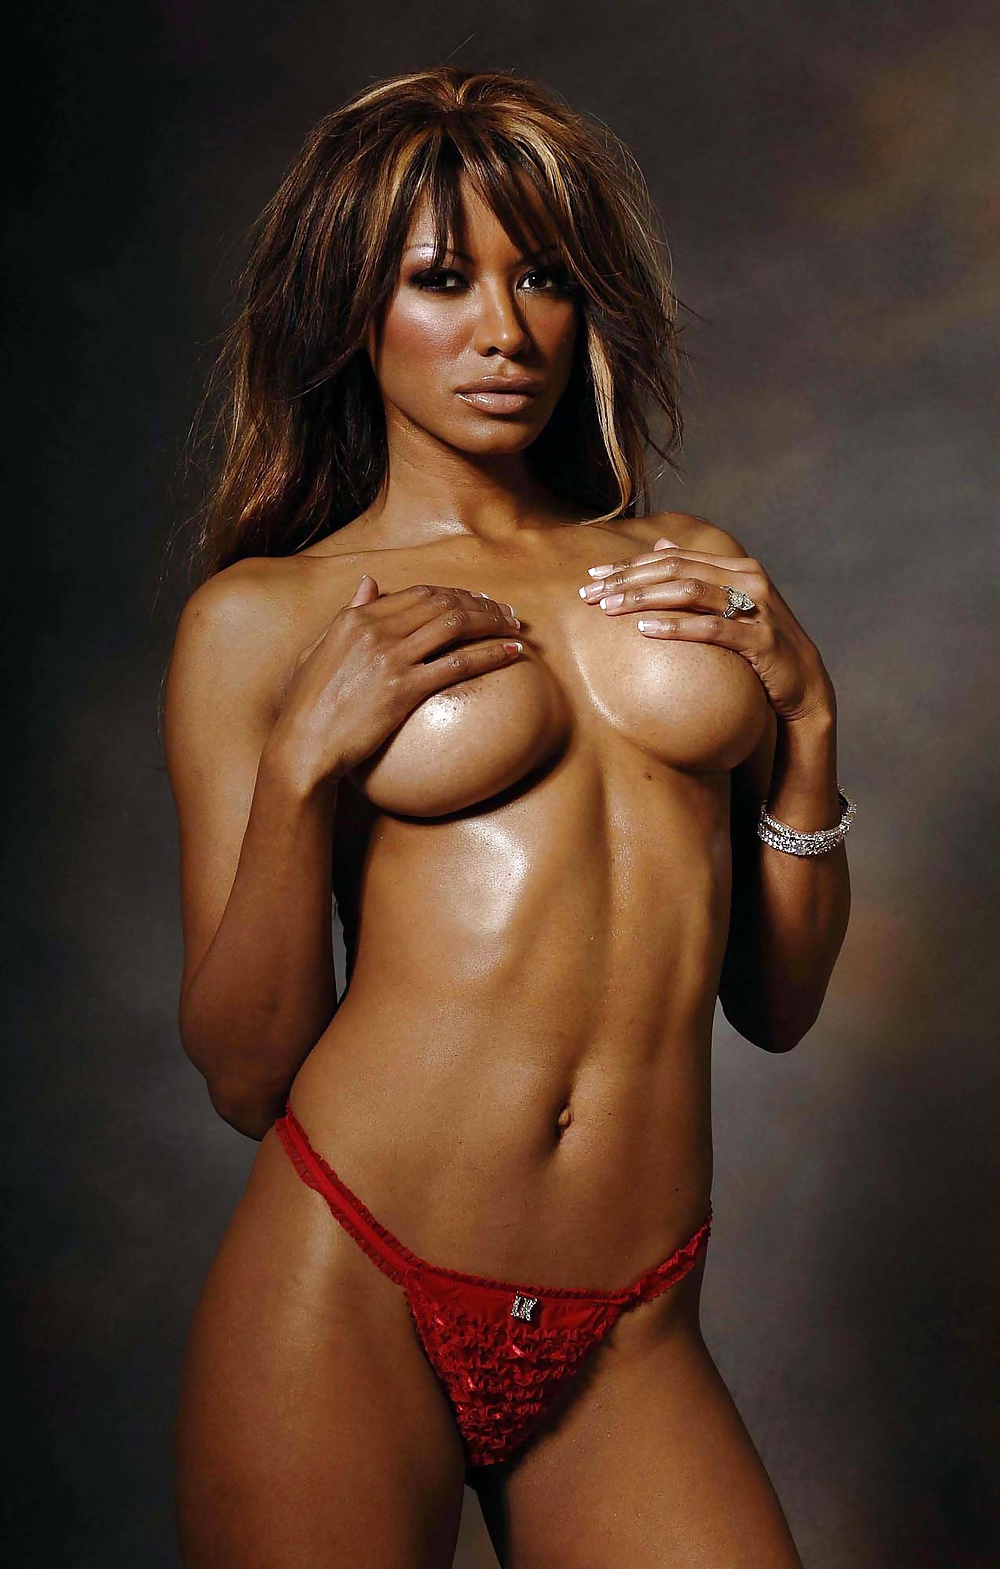 Traci bingham nude